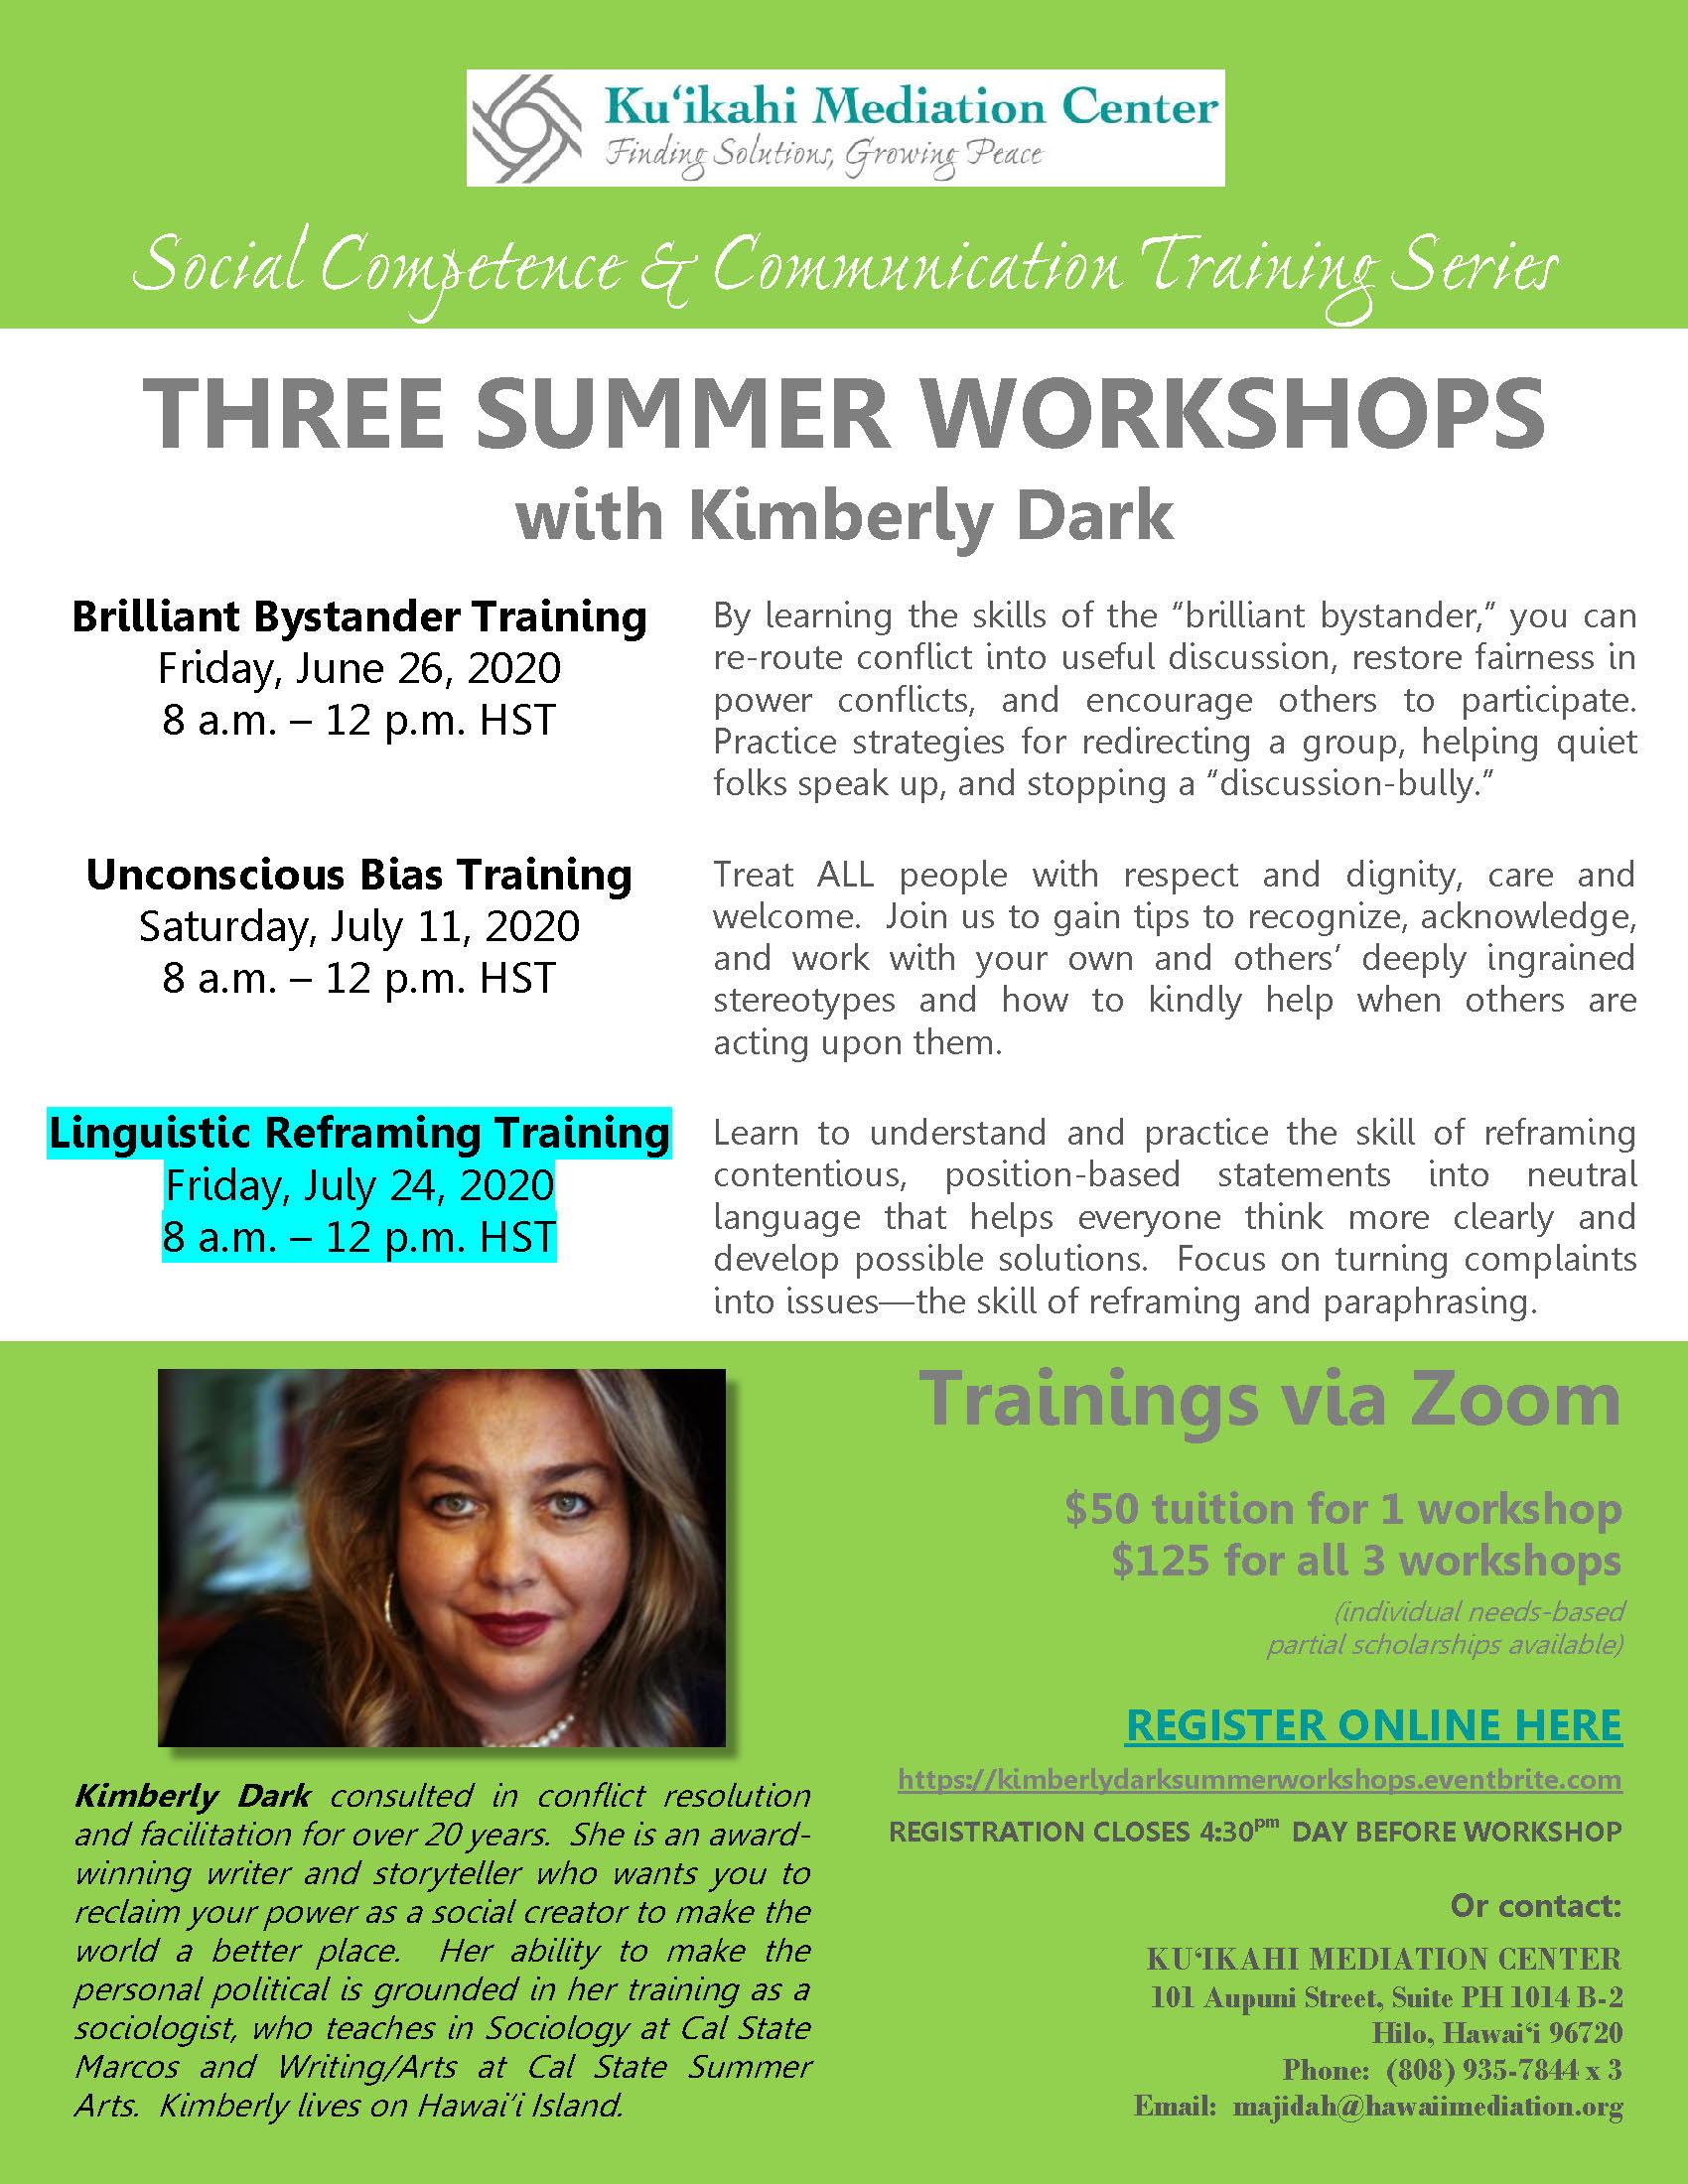 Flyer - Kimberly Dark Three Summer Workshops - Linguistic Reframing Training